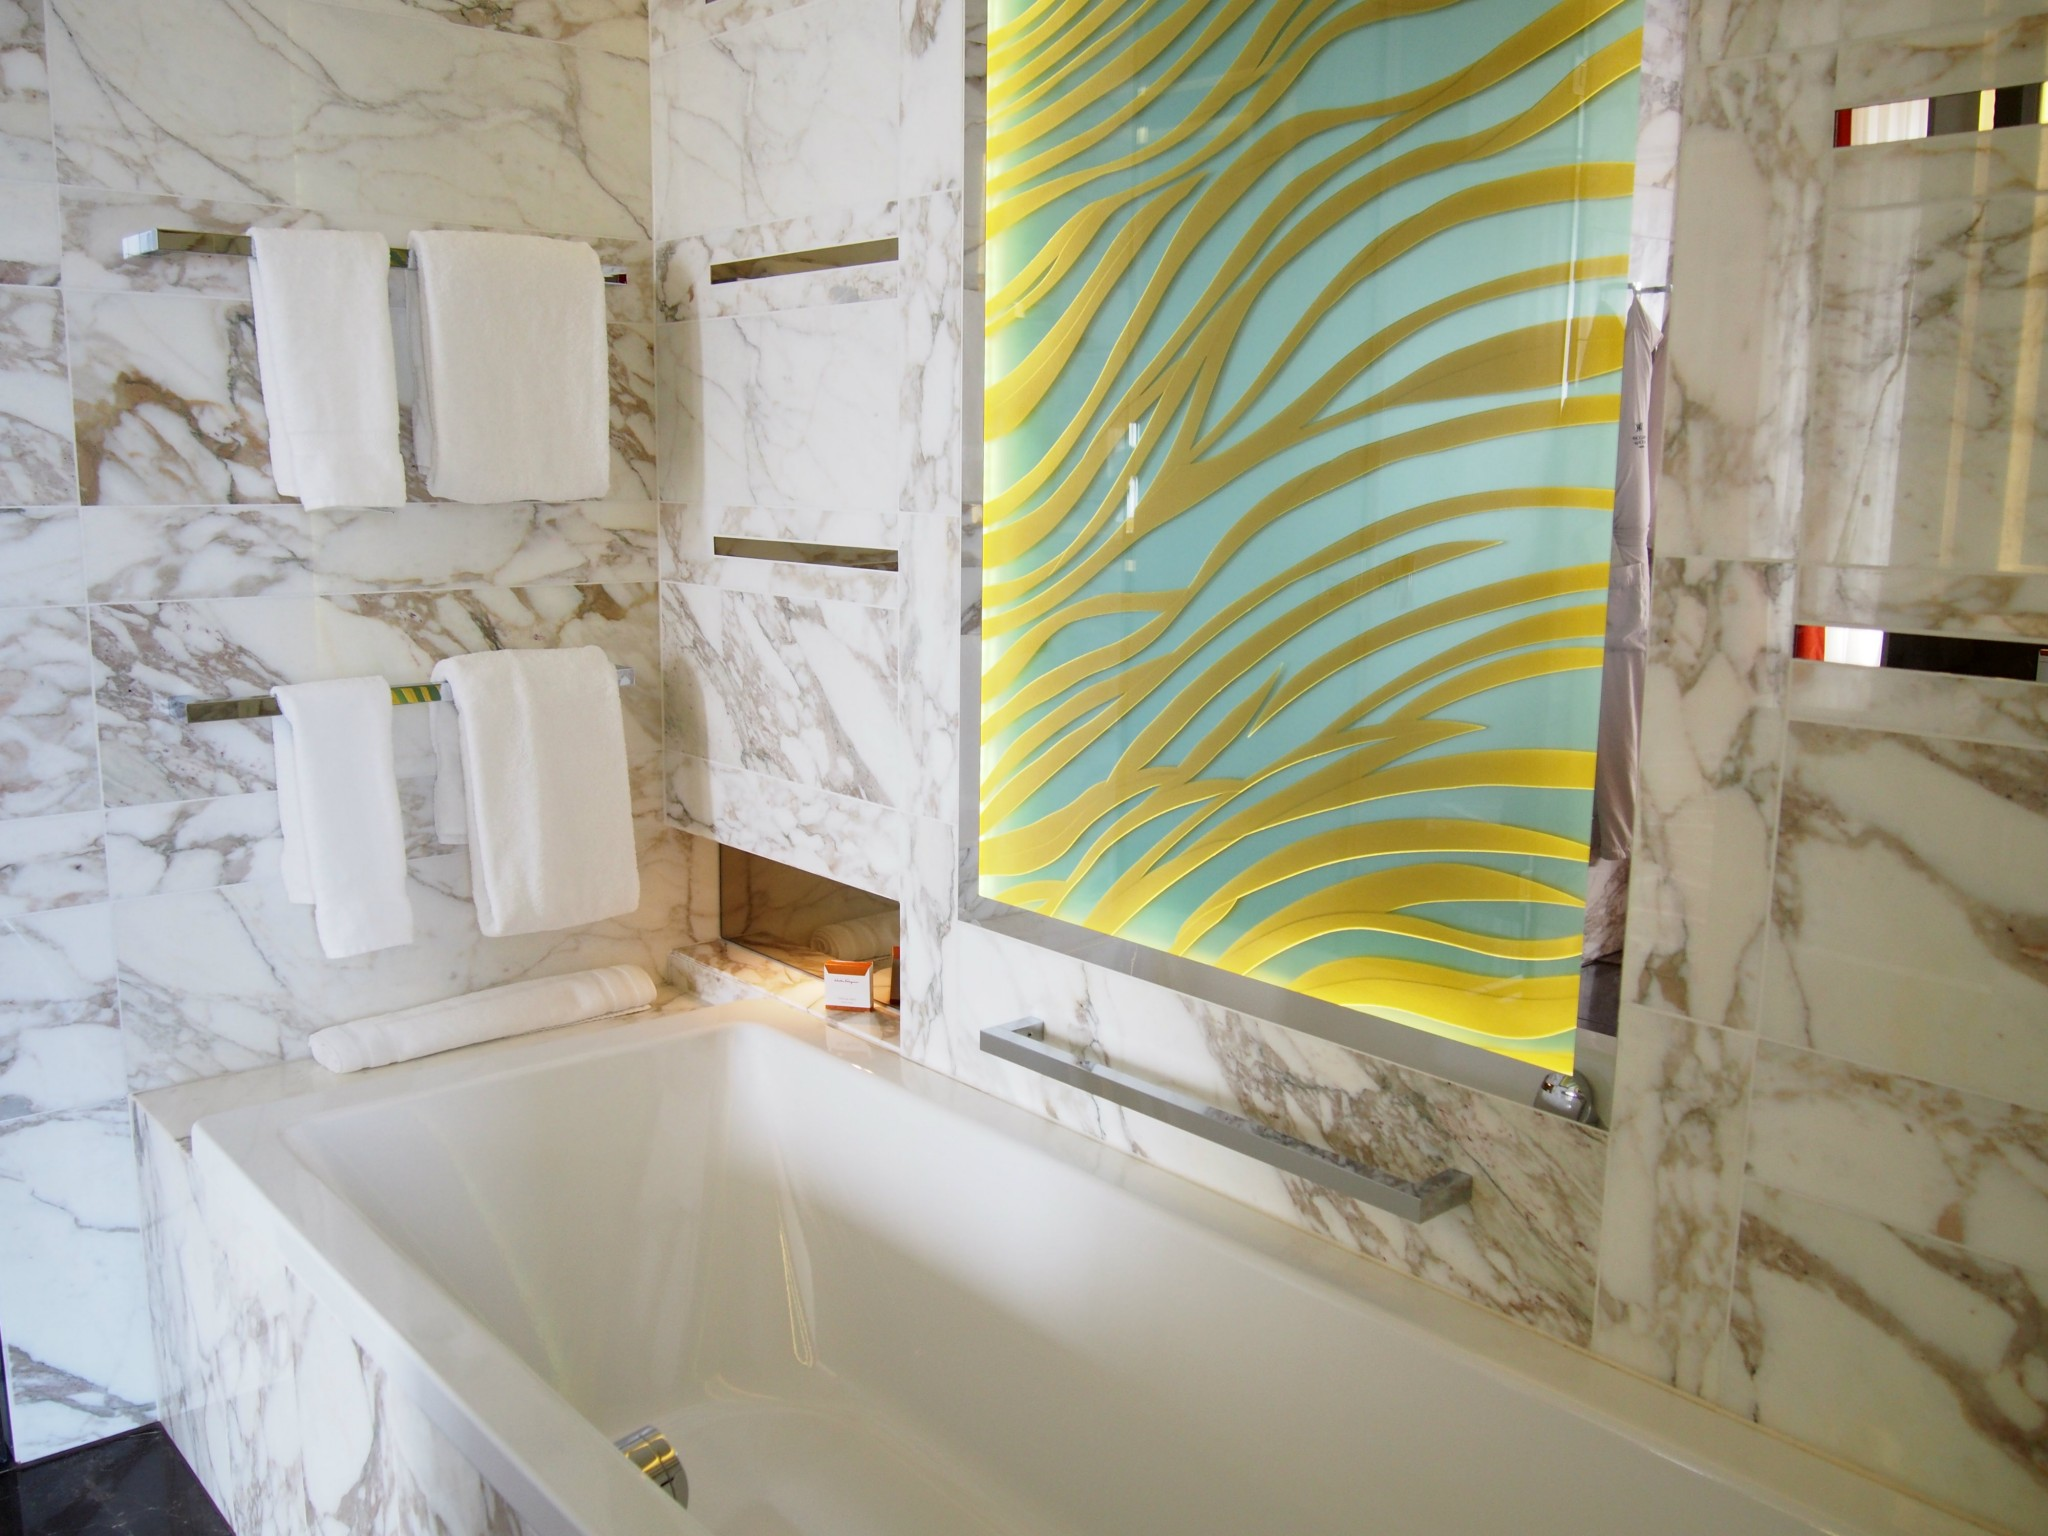 Waldorf Astoria Berlin kylpyamme